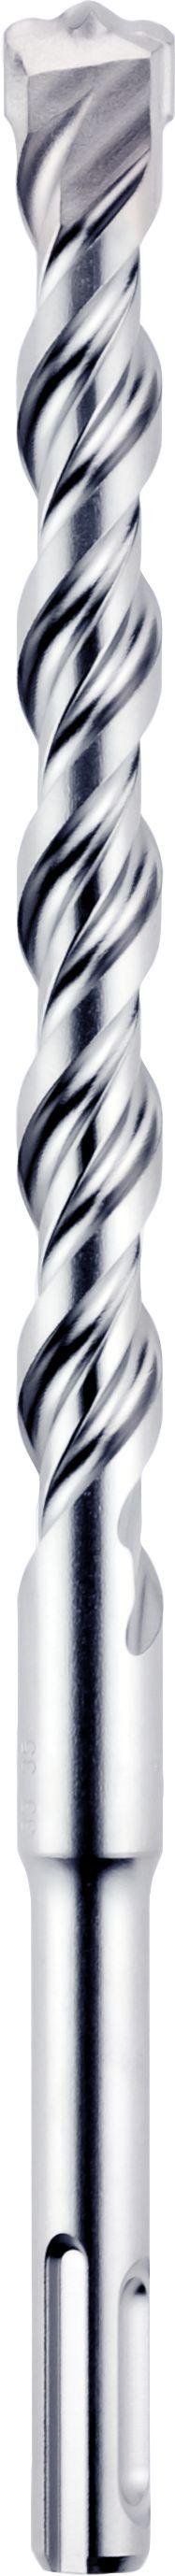 Slika BORER Rocket 3 SDS-plus 14x450 mm